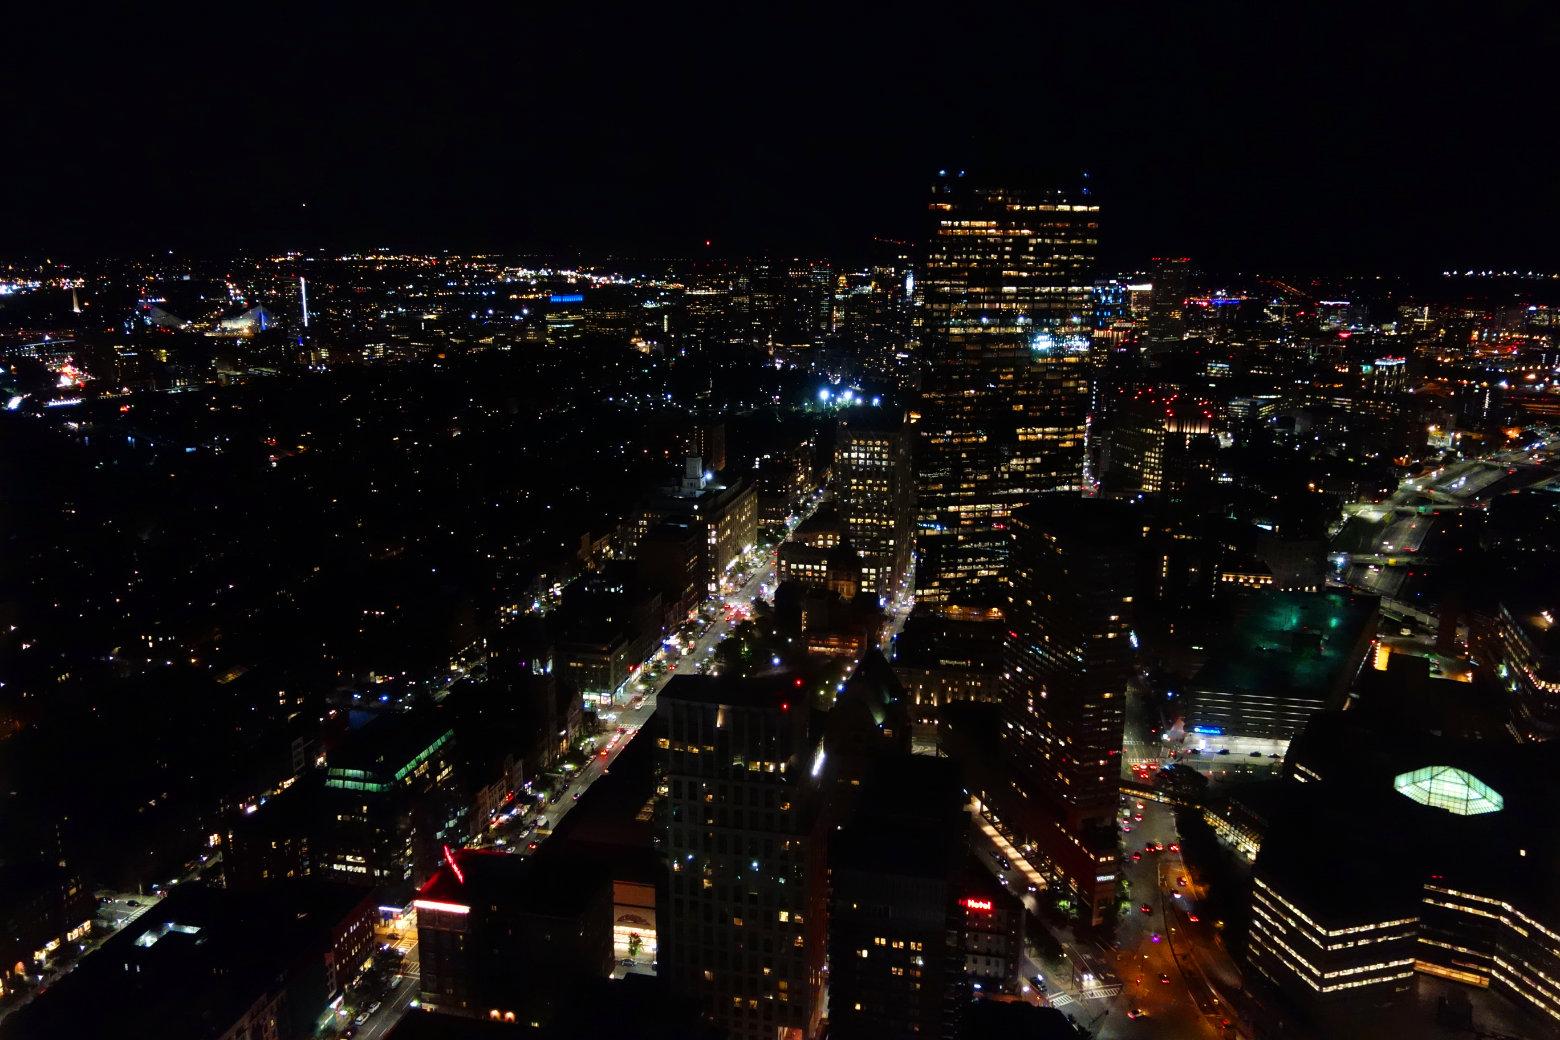 Boston Blick vom Prudential Tower nachts